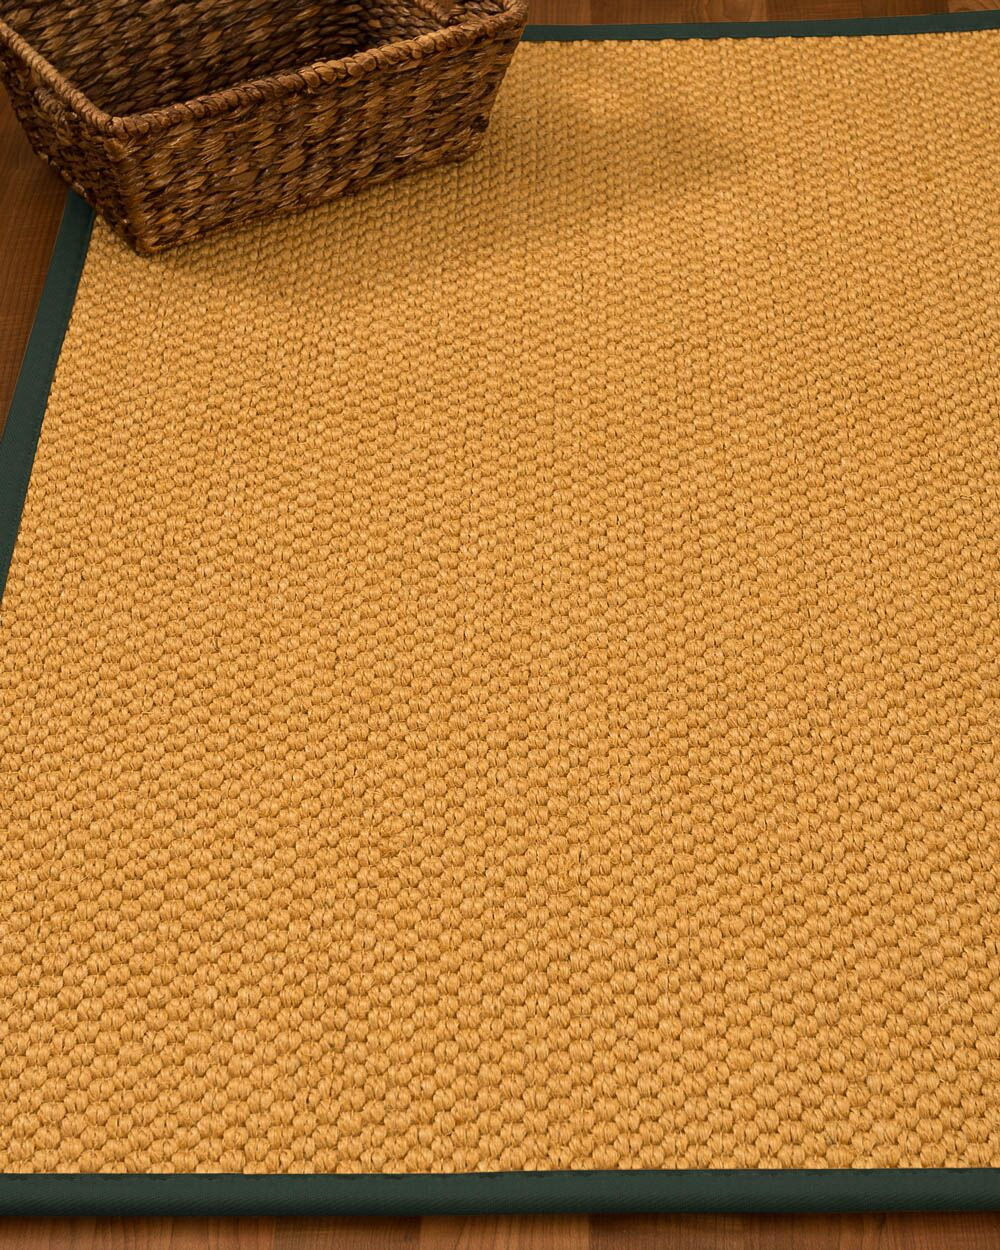 Kimes Hand-Woven Beige Area Rug Rug Size: Rectangle 4' x 6'